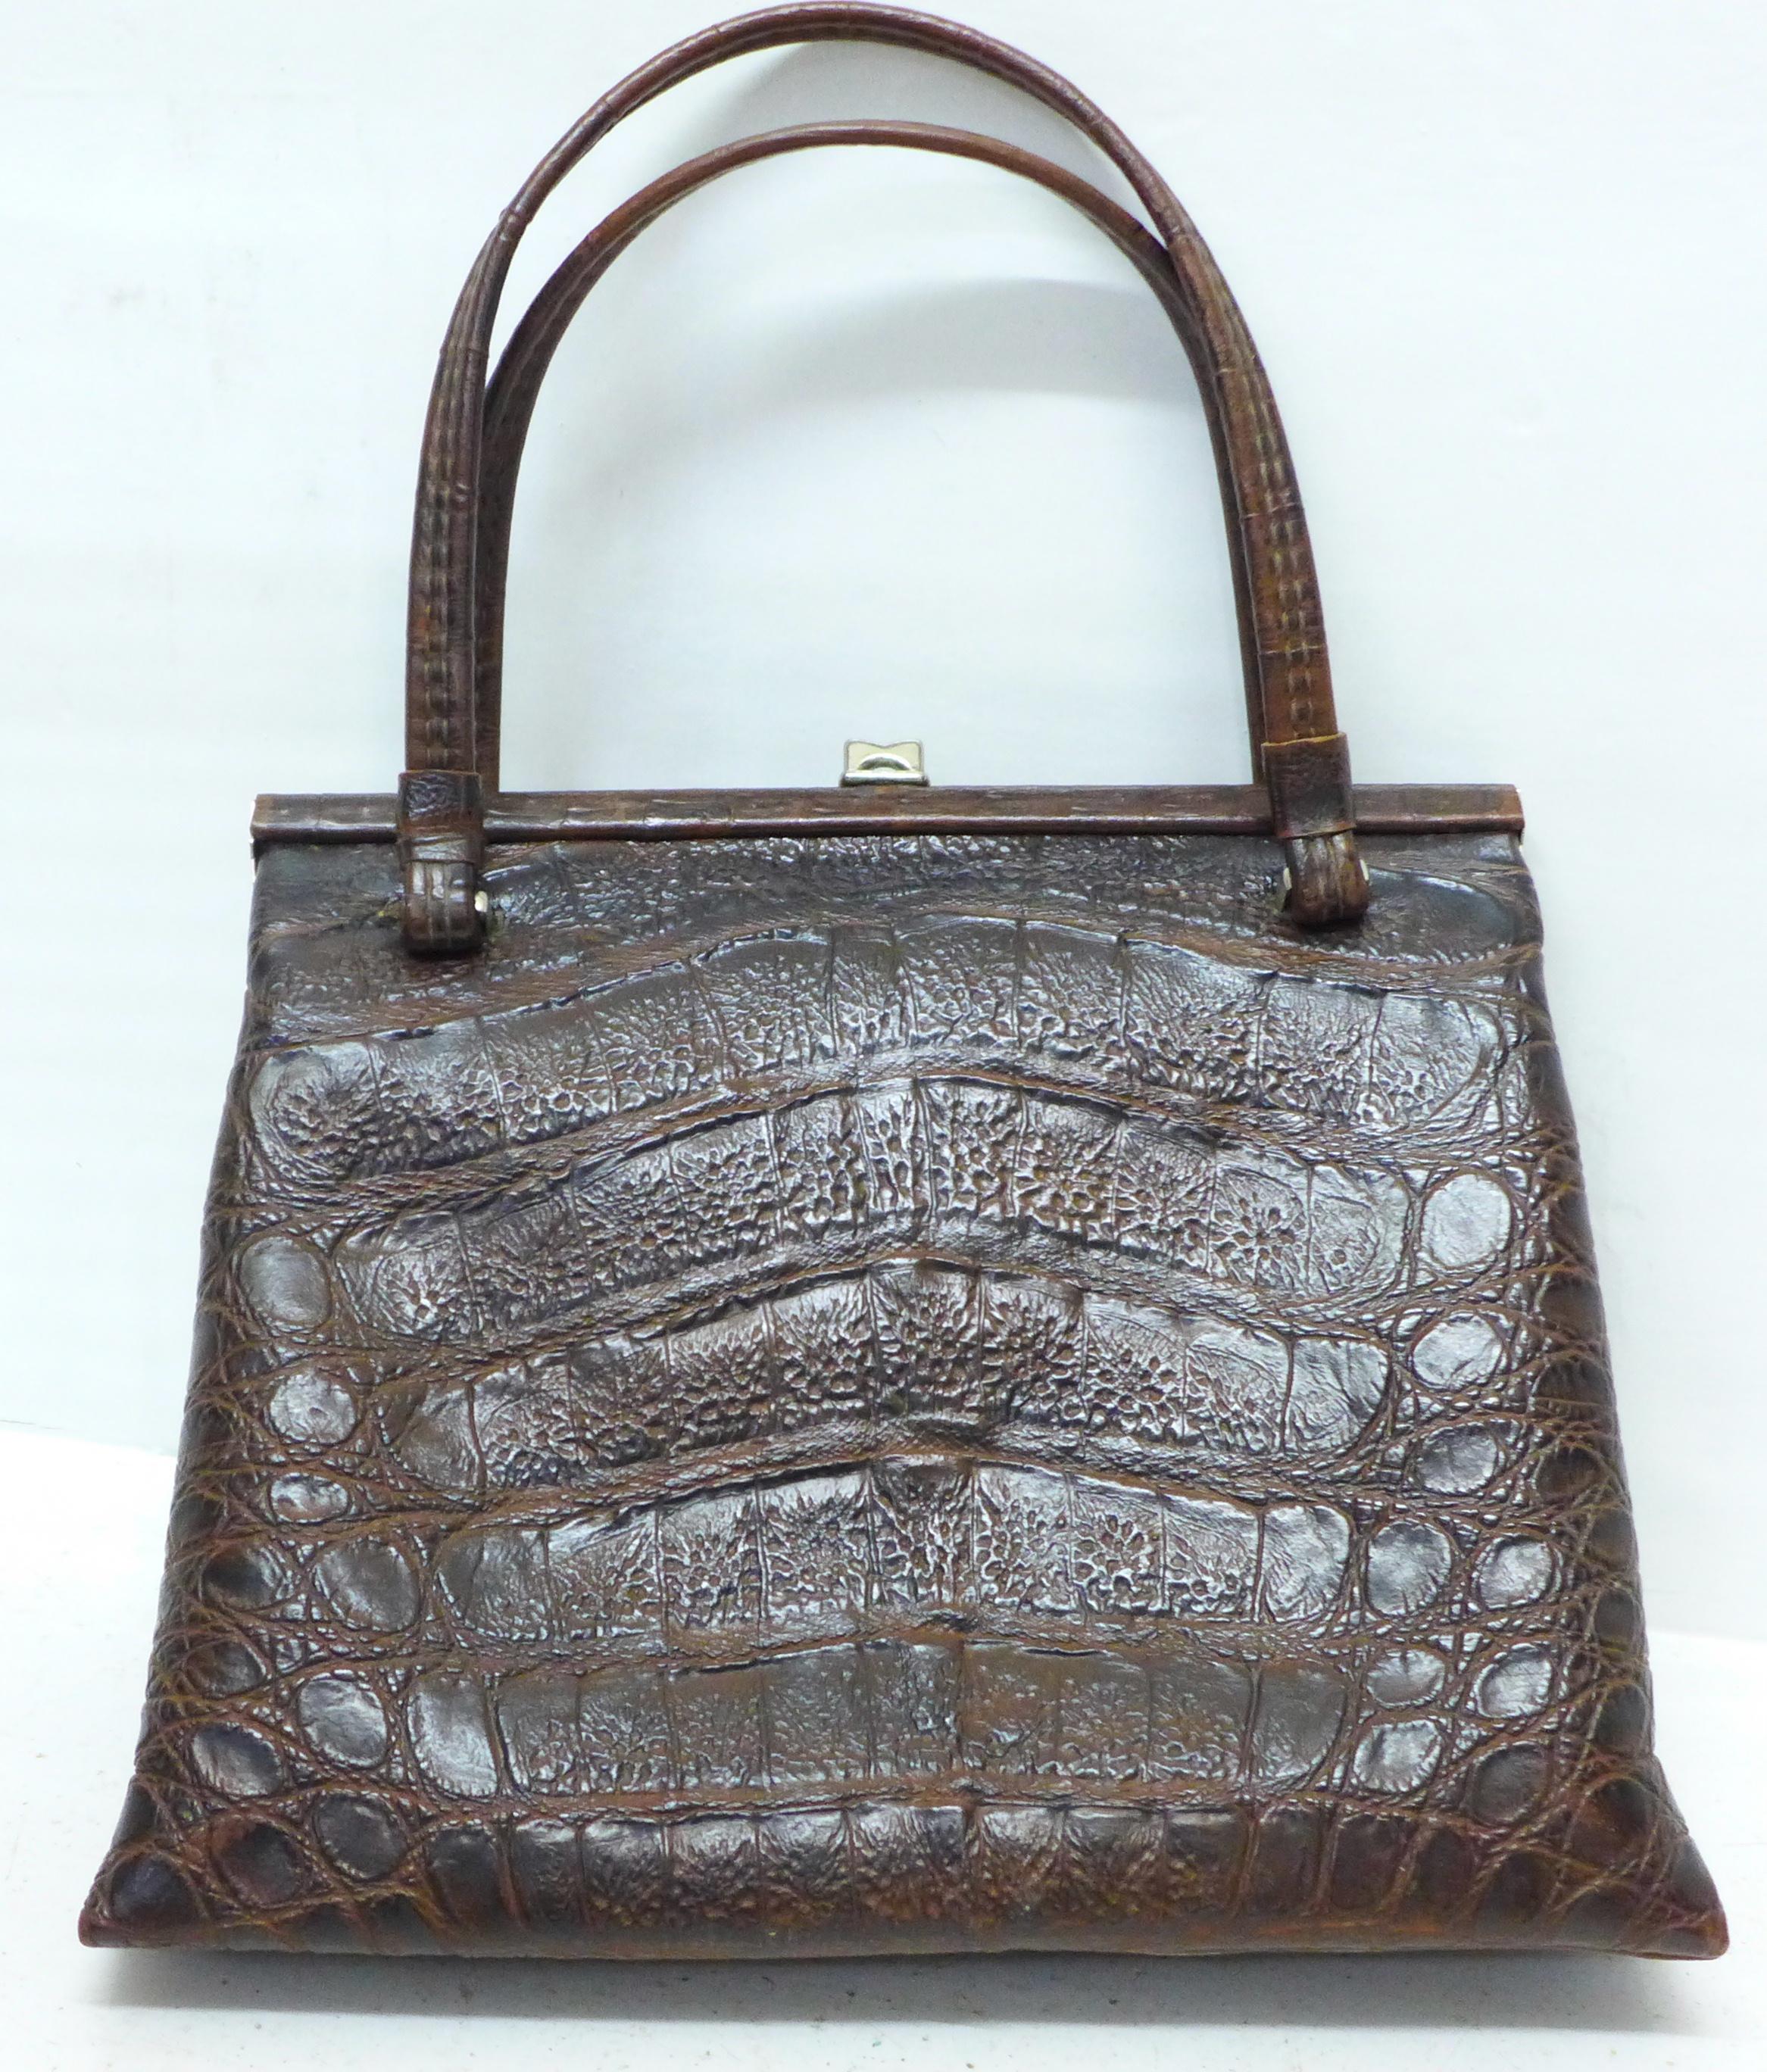 A Rieke vintage faux crocodile skin handbag - Image 2 of 4